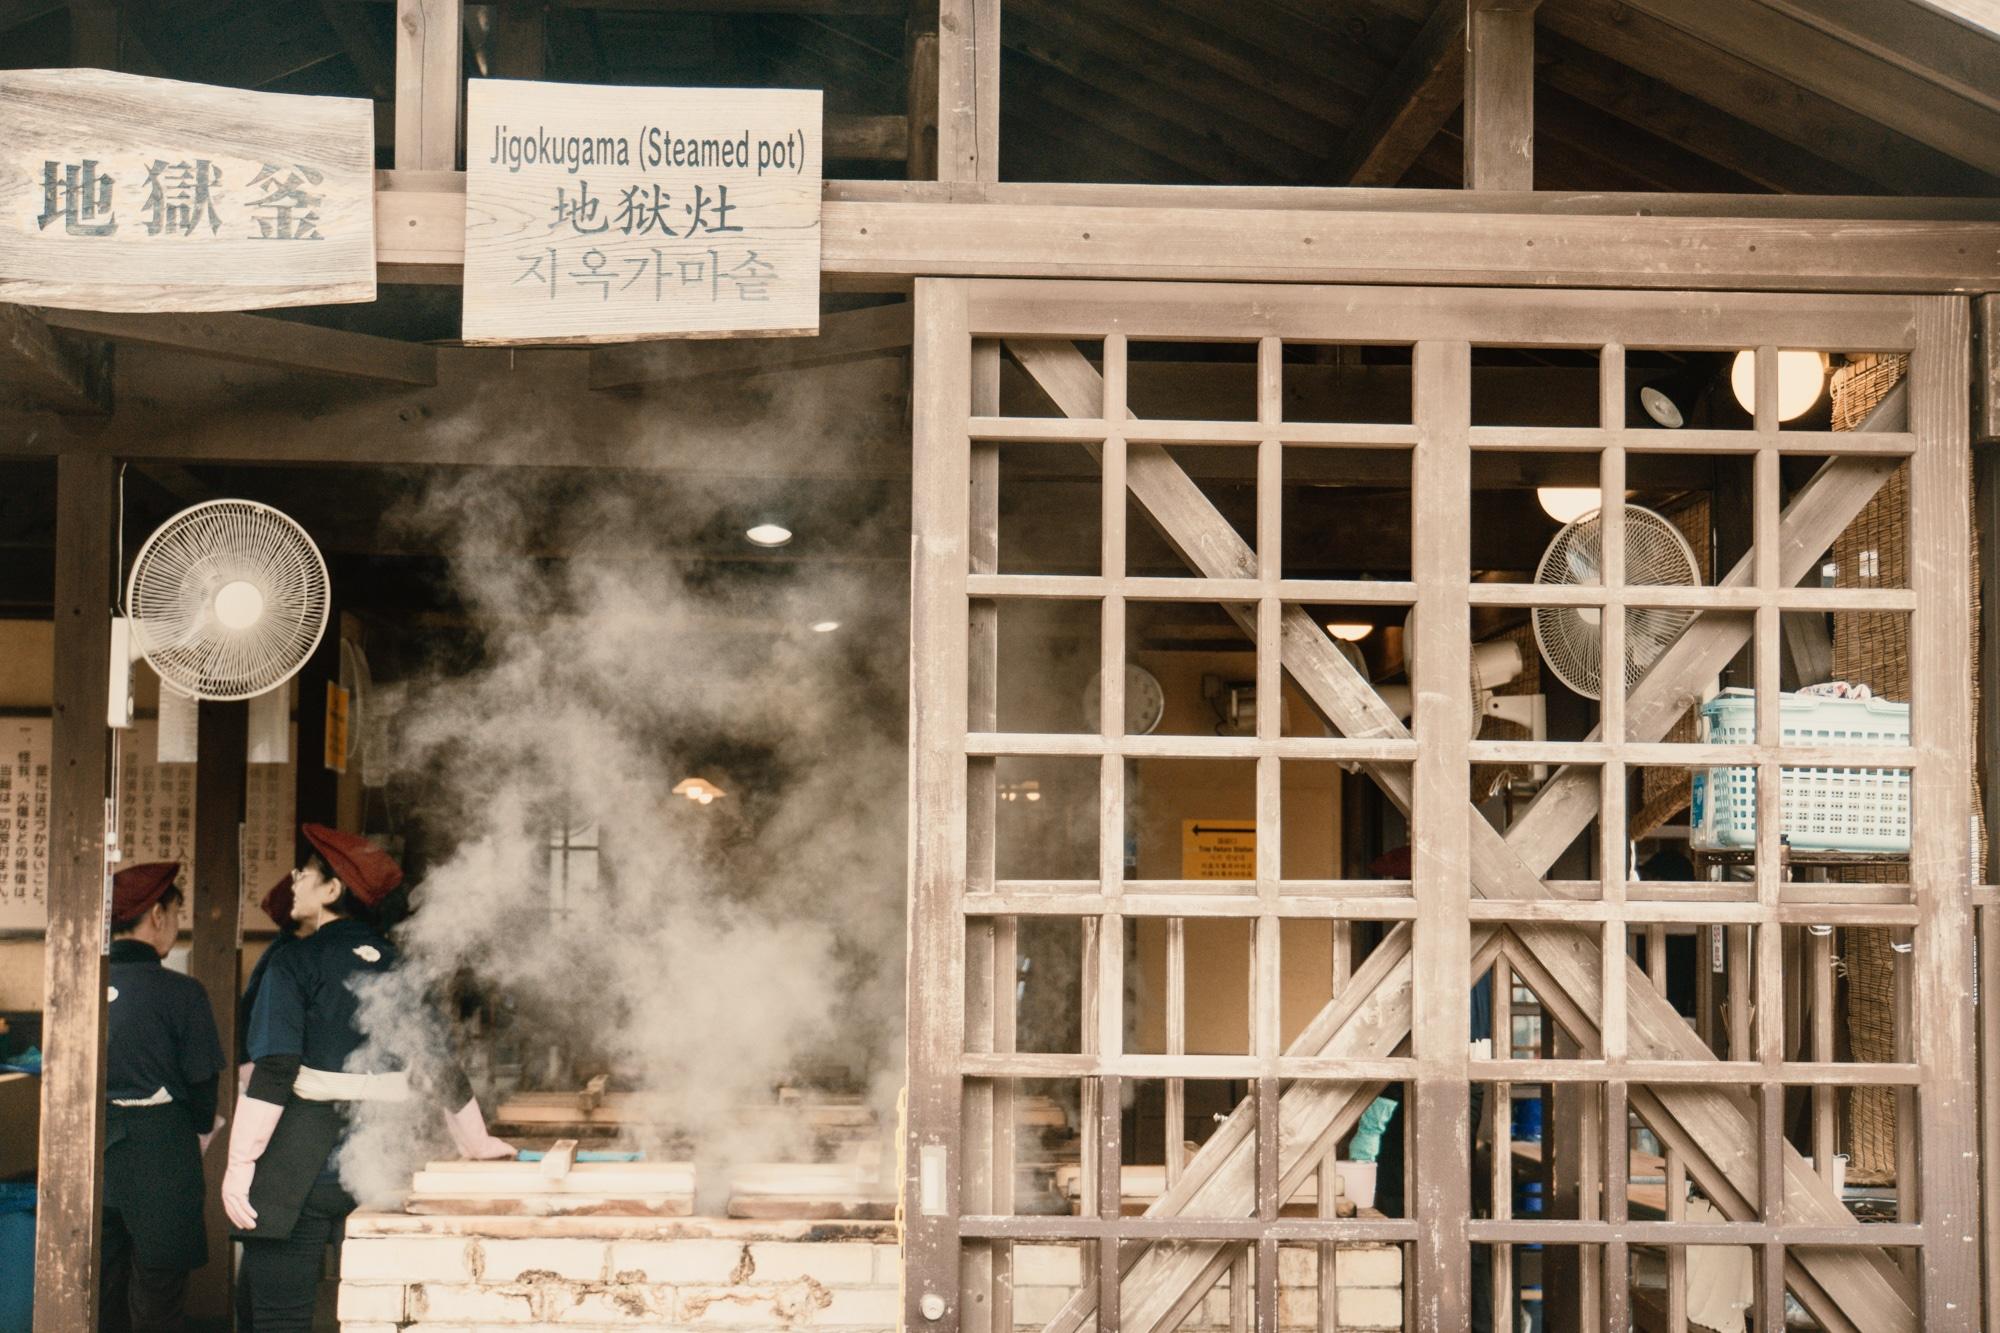 Kyushu Rundreise: Reisetipps, Onsen und Highlights in Japans Süden - Kurokawa Onsen Hopping - Beppu Chinetsu Kanko Labo Enma